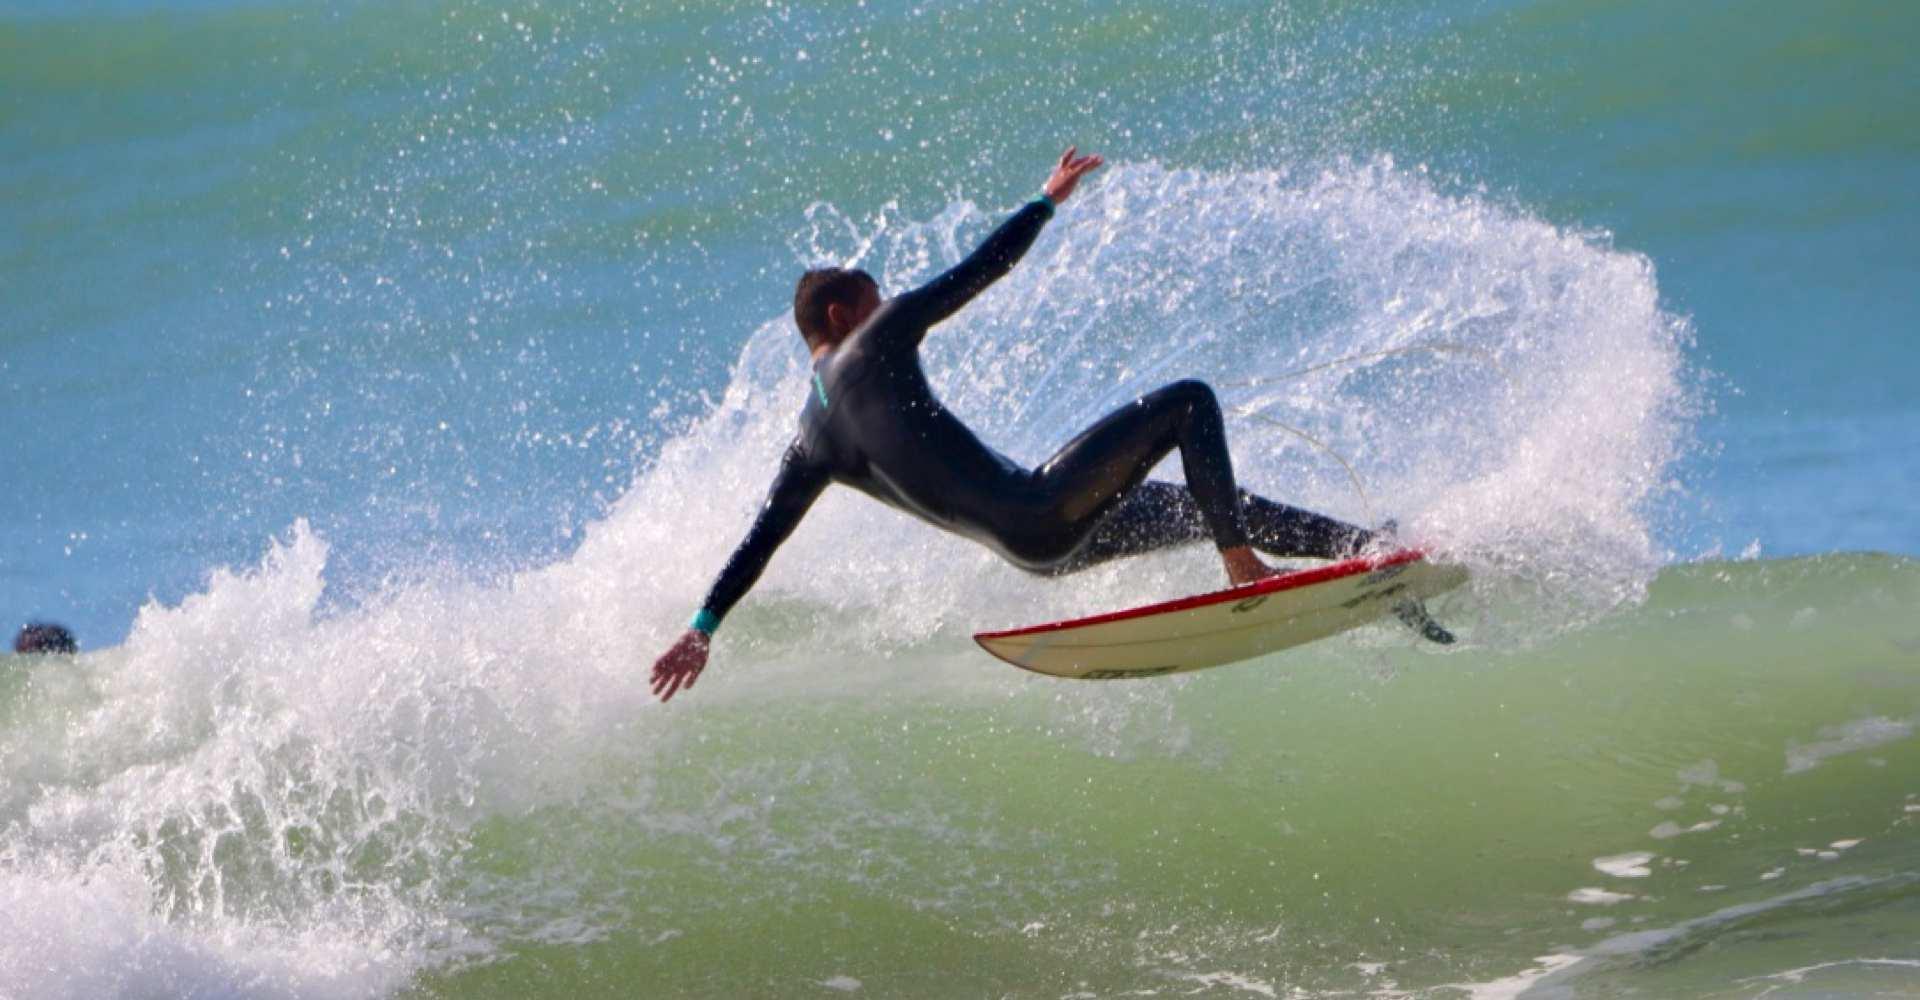 alquilar tablas de surf